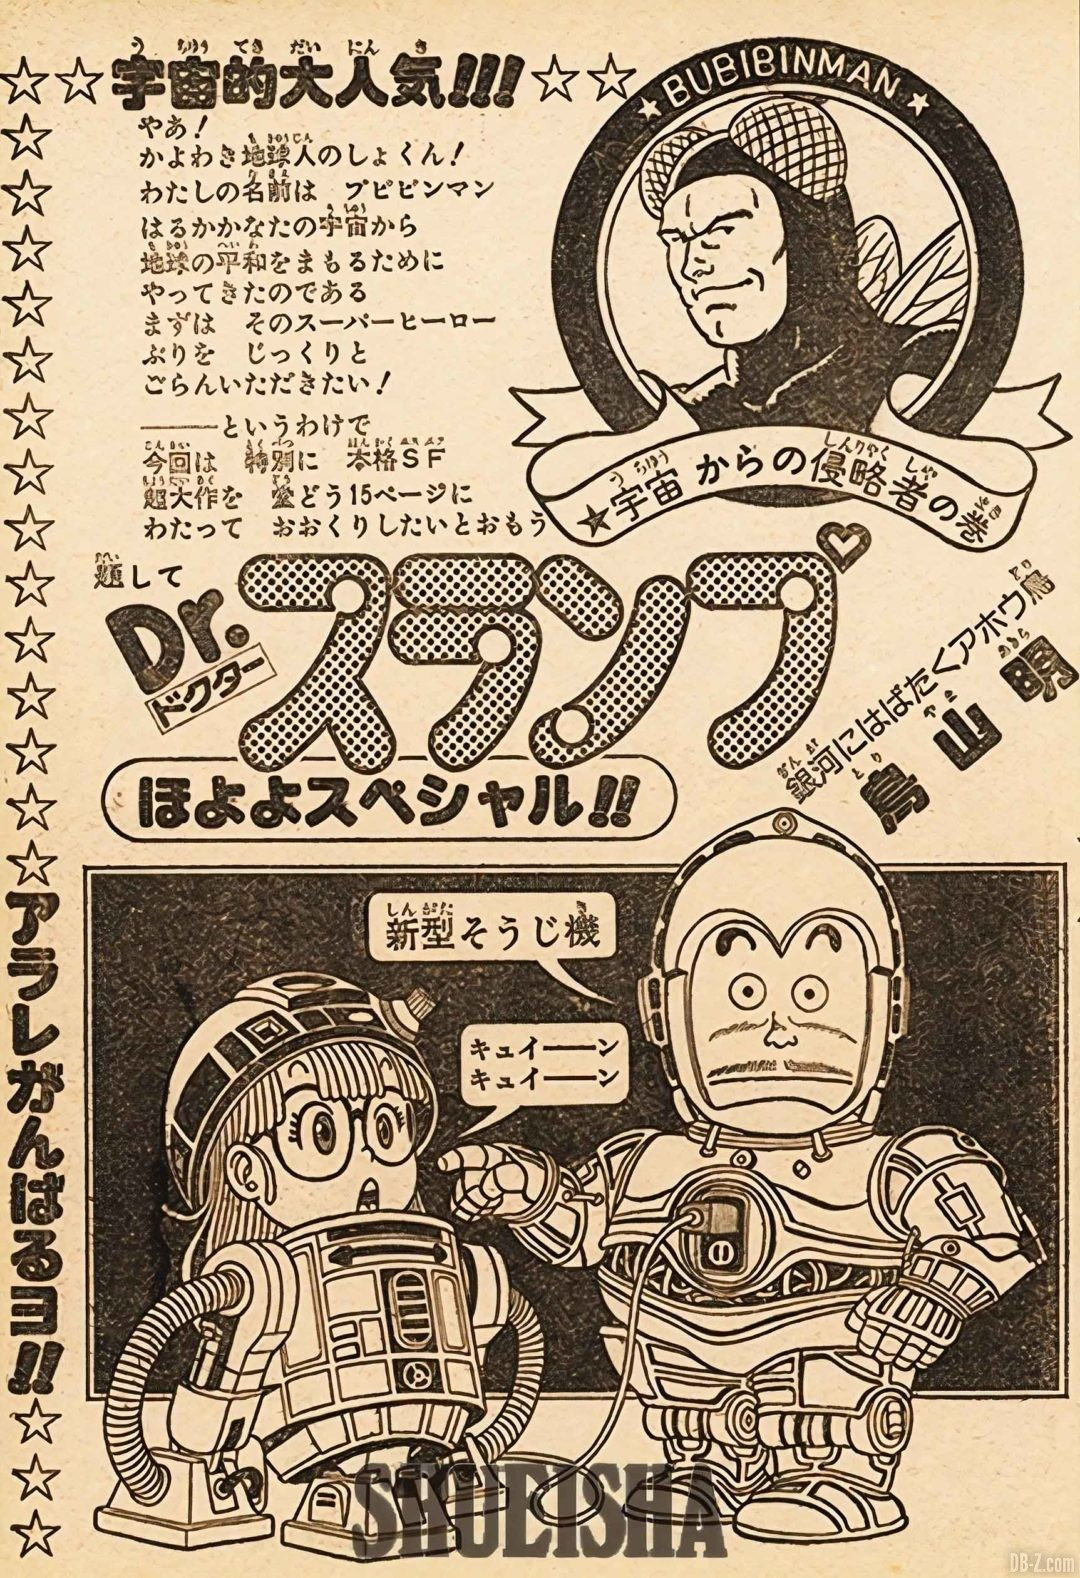 Akira-Toriyama-star-wars-10-mars-2021